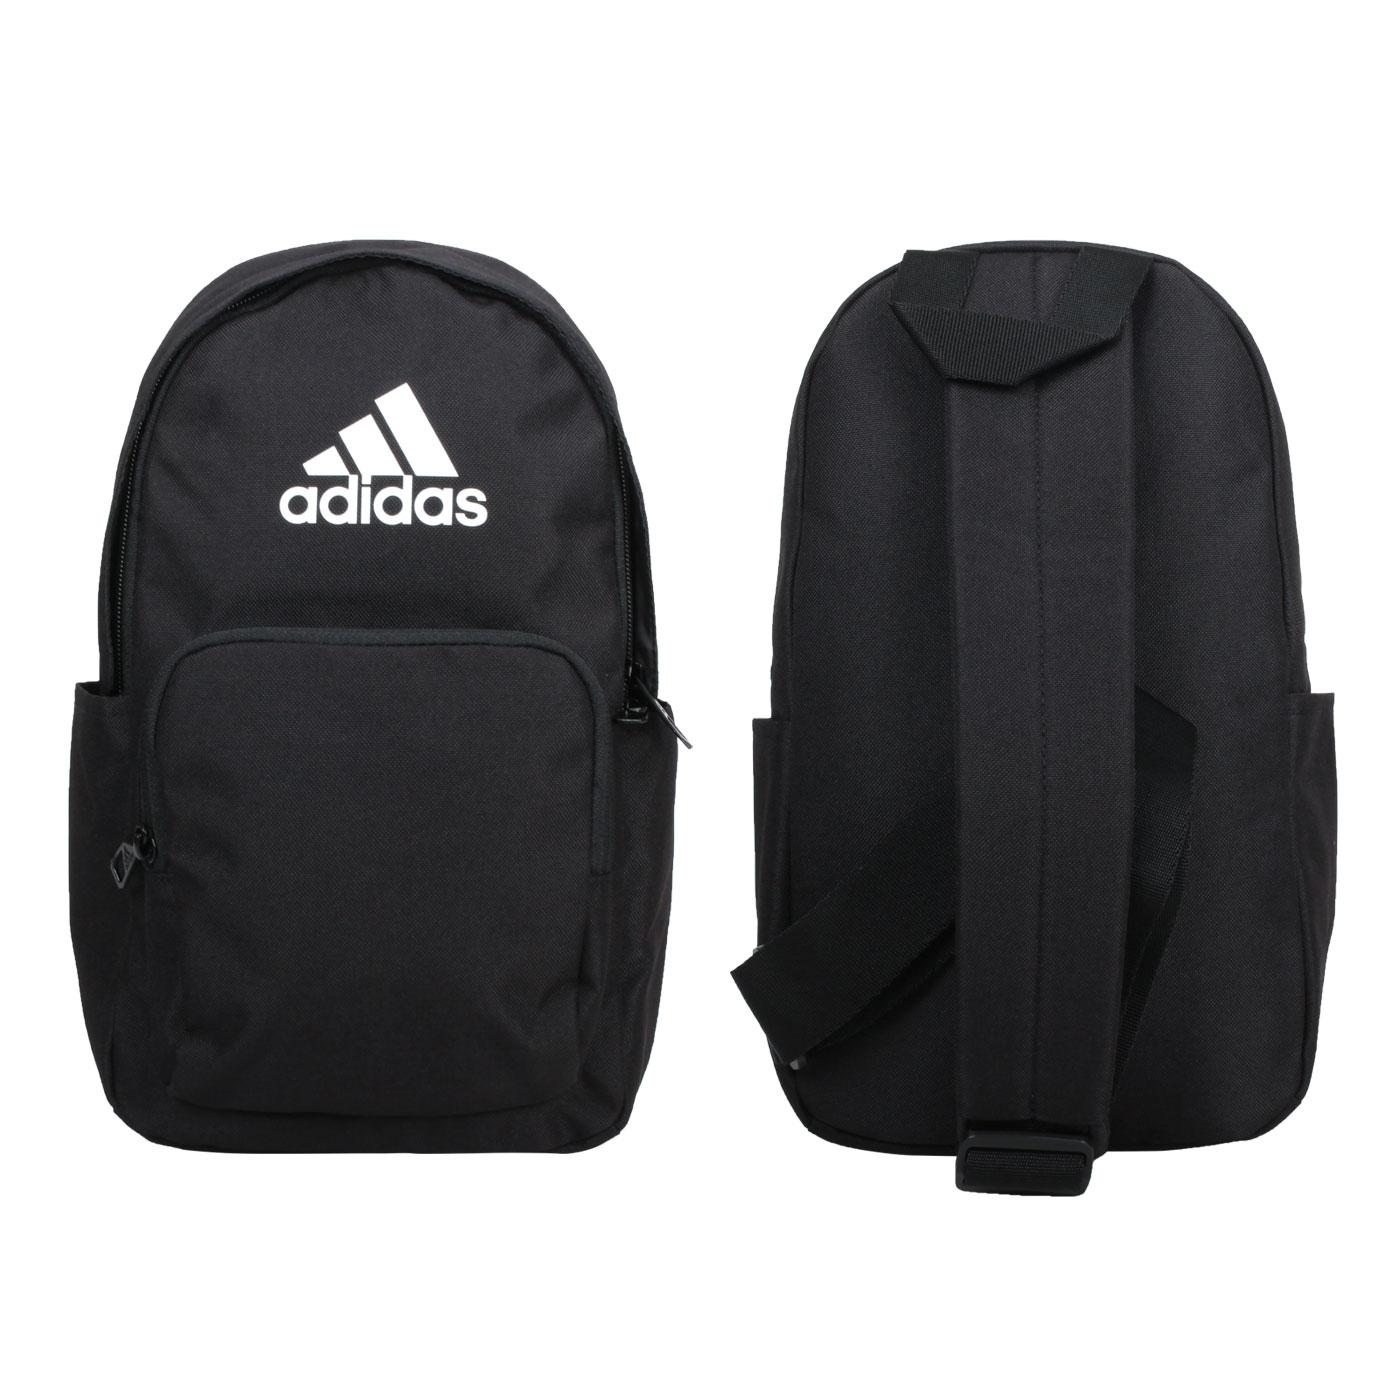 ADIDAS 中型側背包 H30358 - 黑白